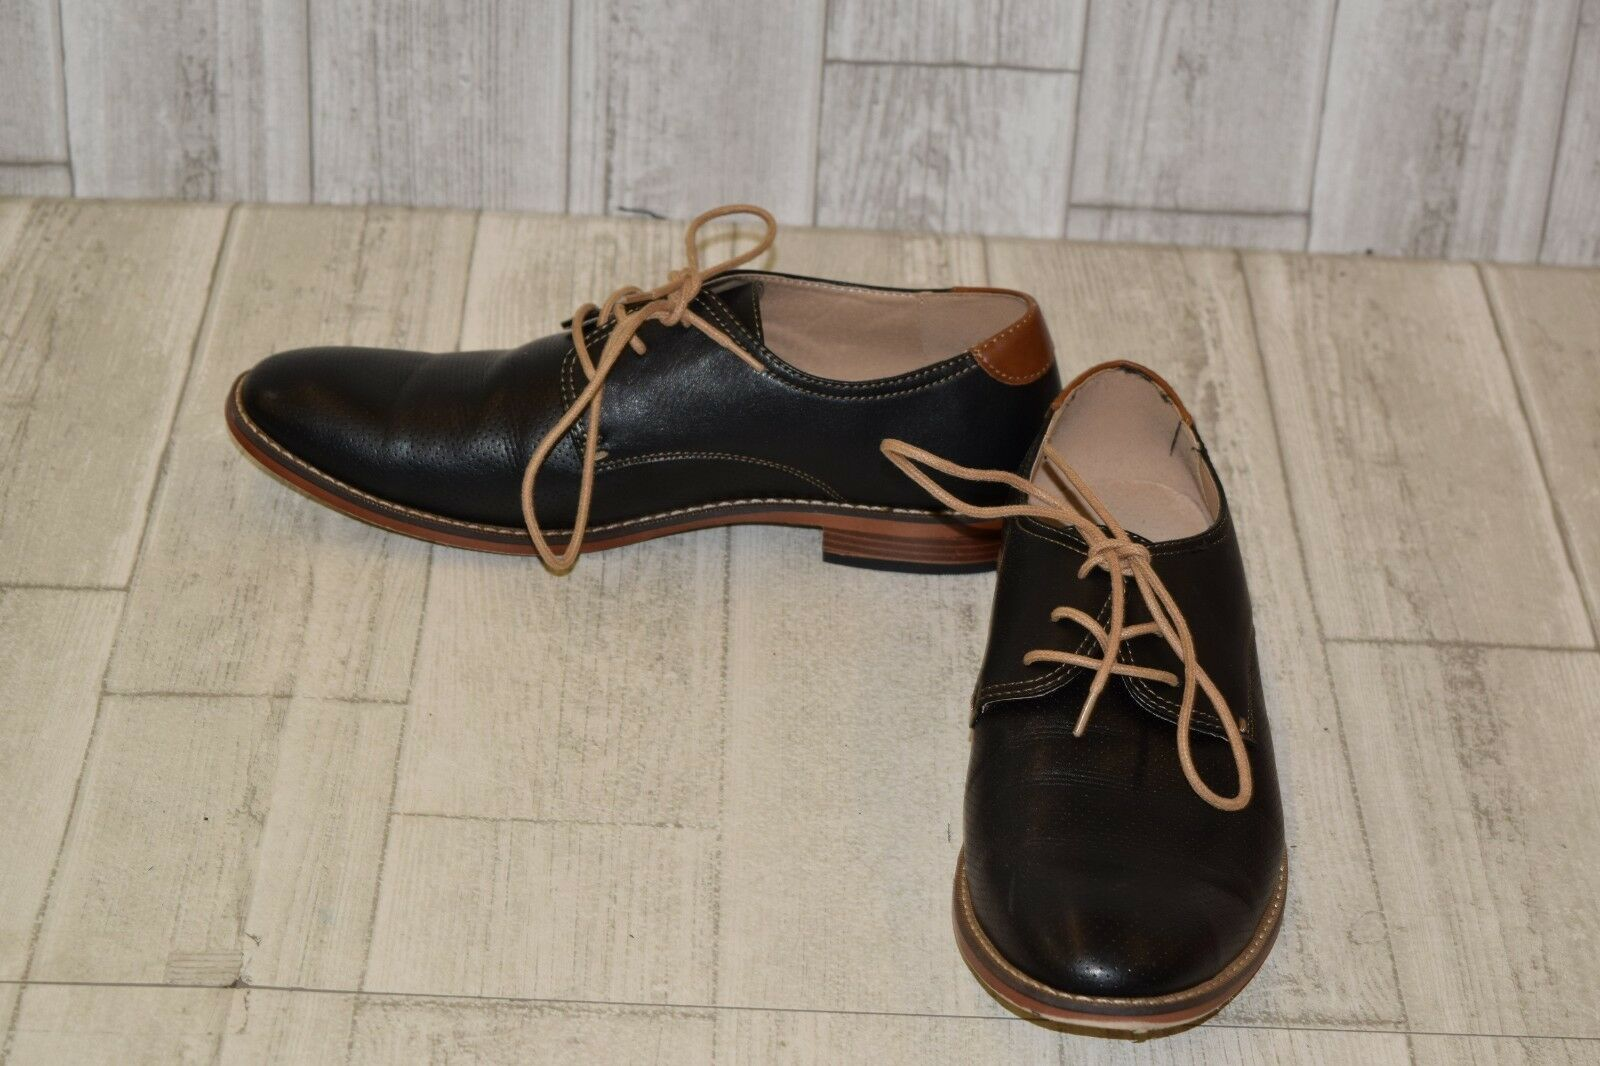 Madden M-Chelan Oxford-Men's Size 9.5M Black